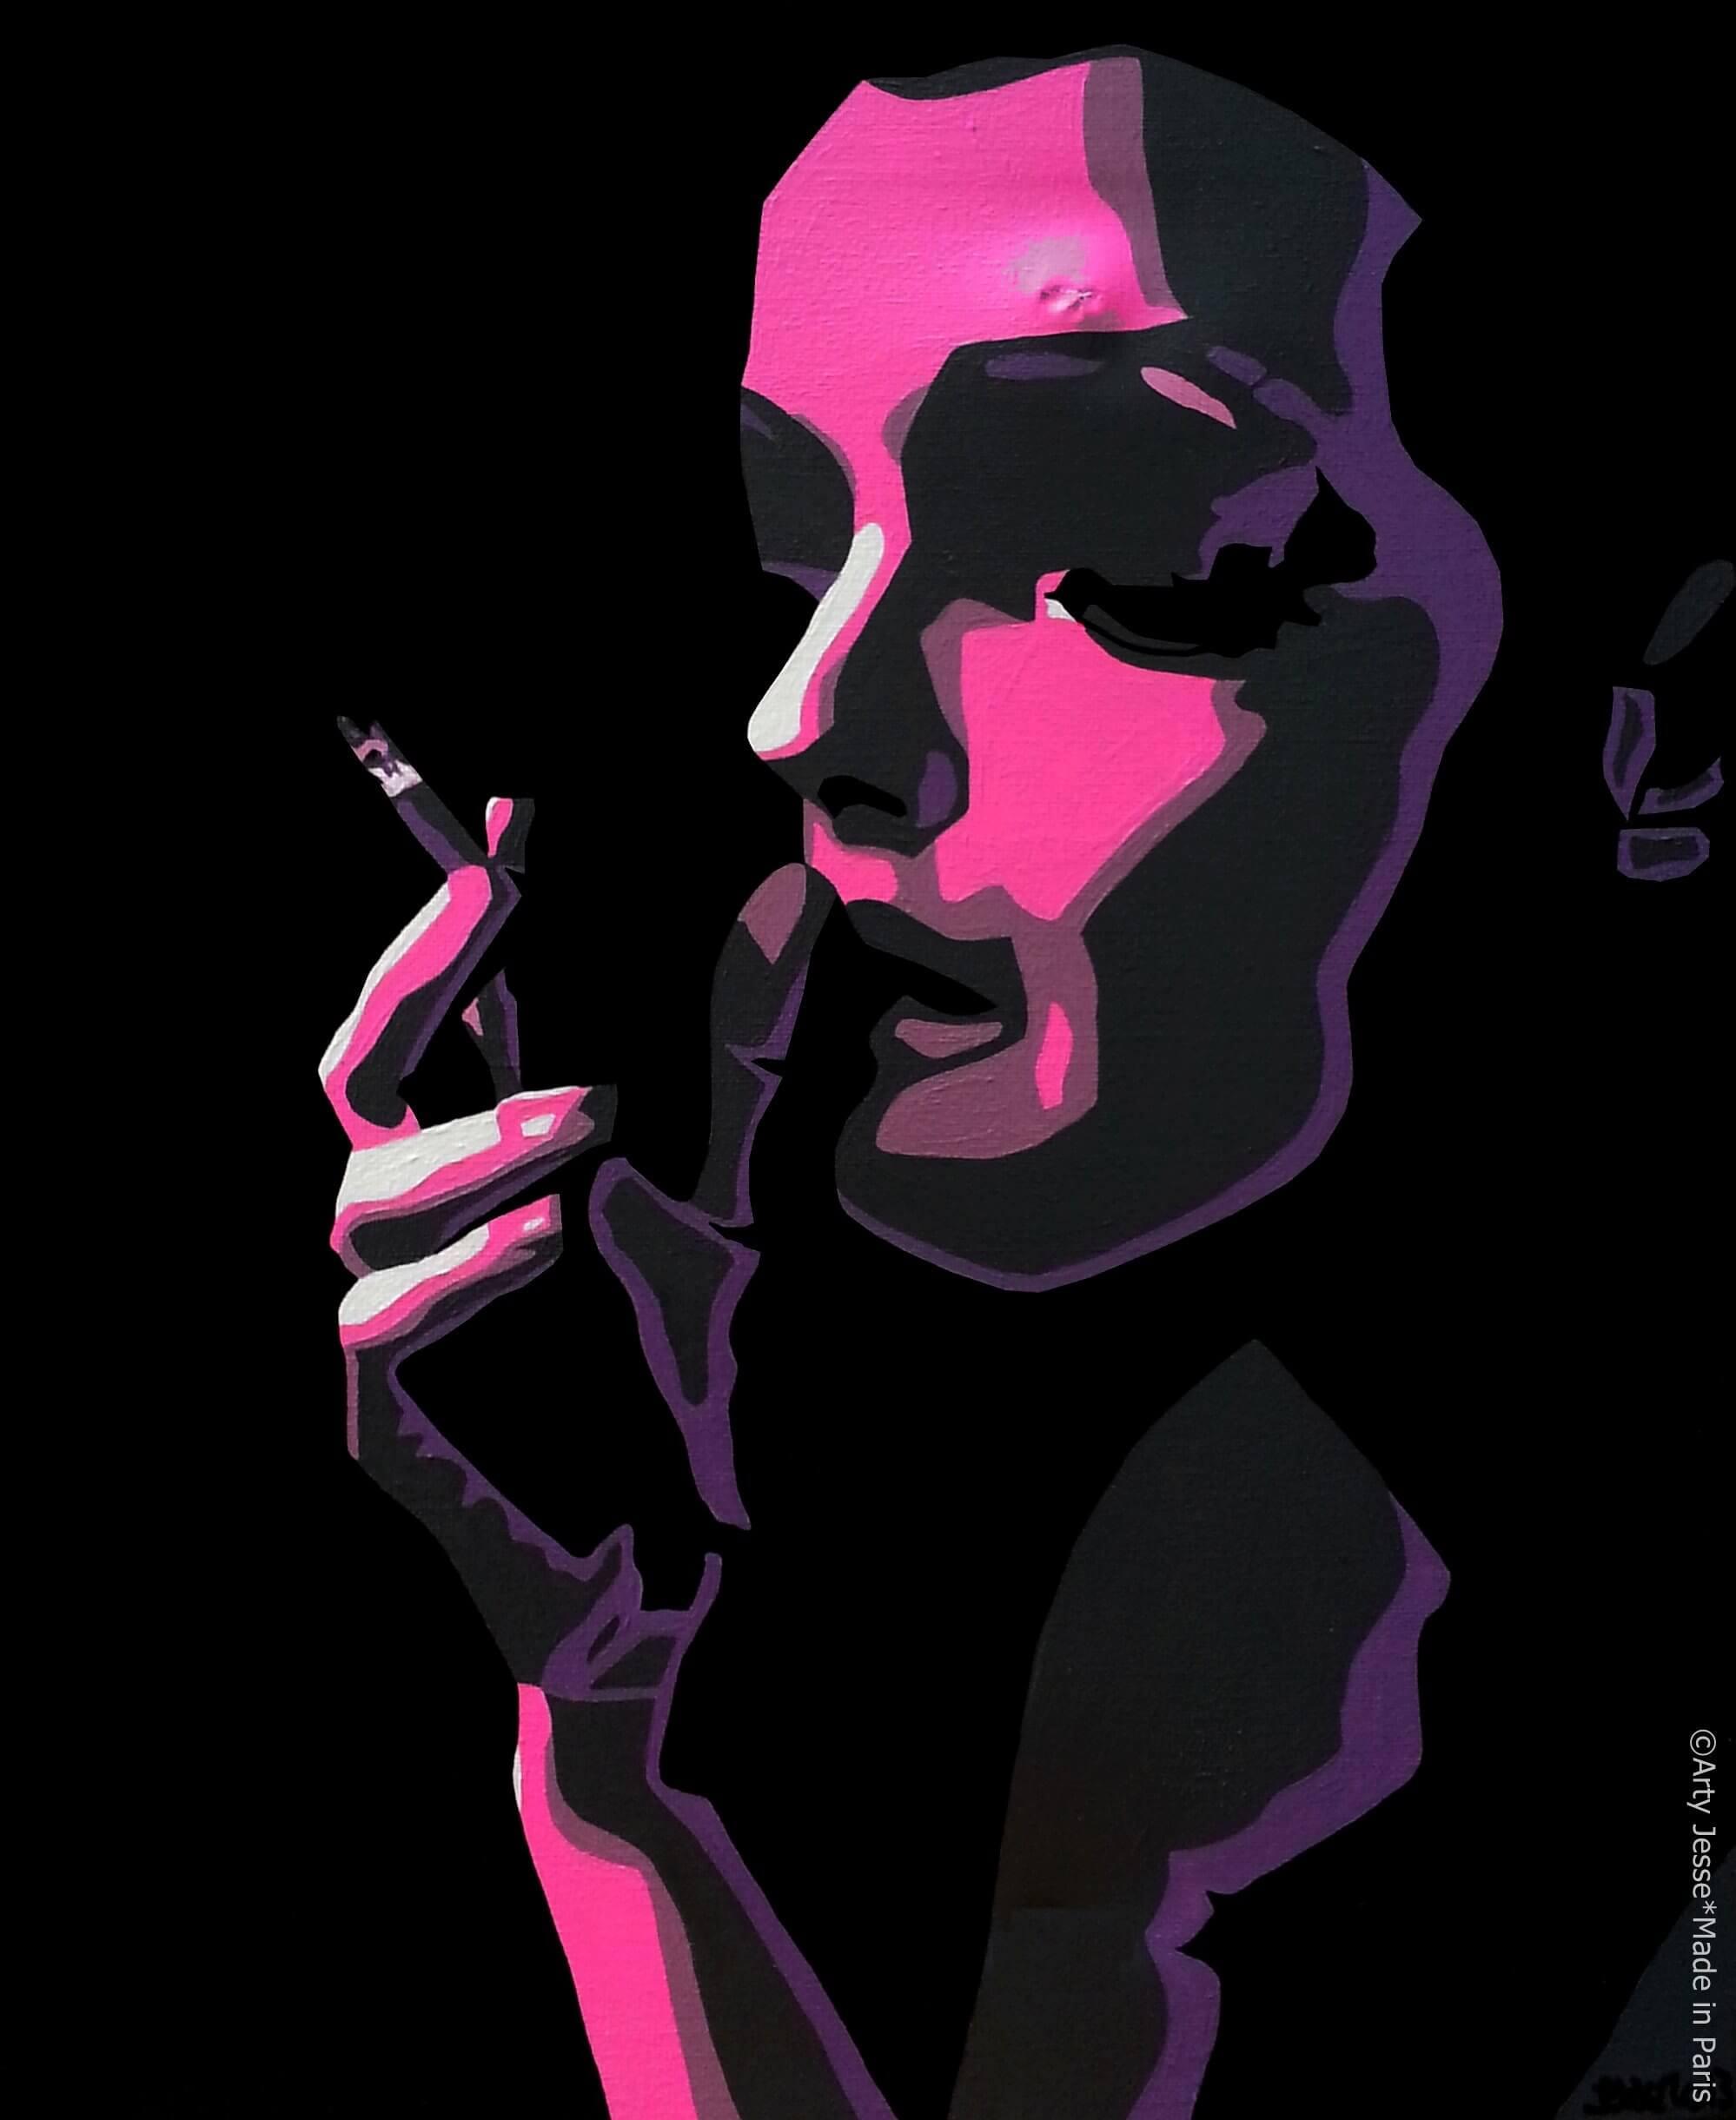 artiste peintre paris, smoker painting, smoker art, romy schneider painting